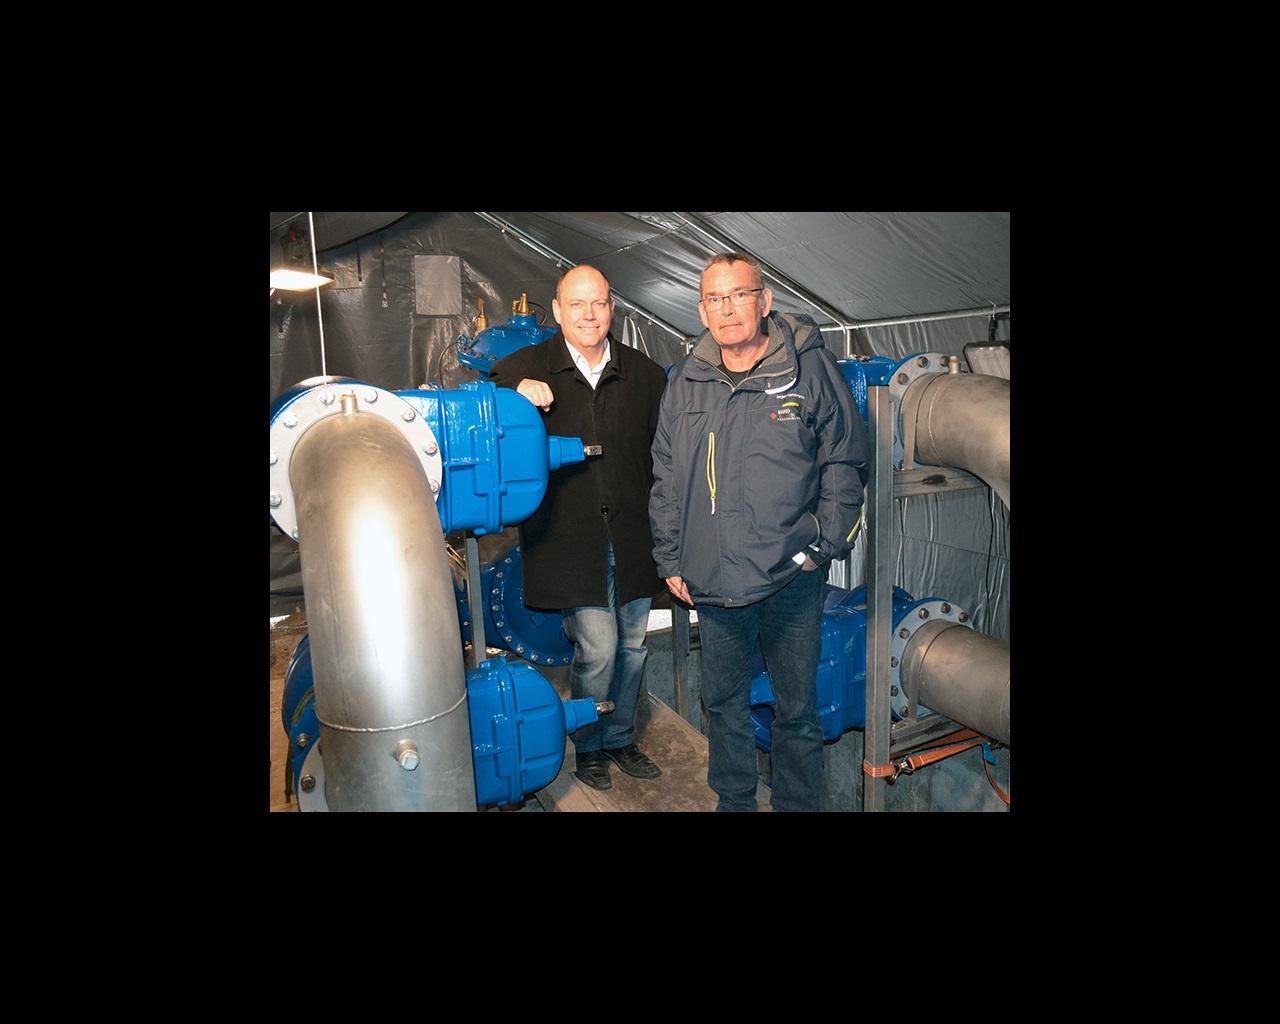 AVK ventiler i ny vandledning mellem Frederikshavn og Skagen